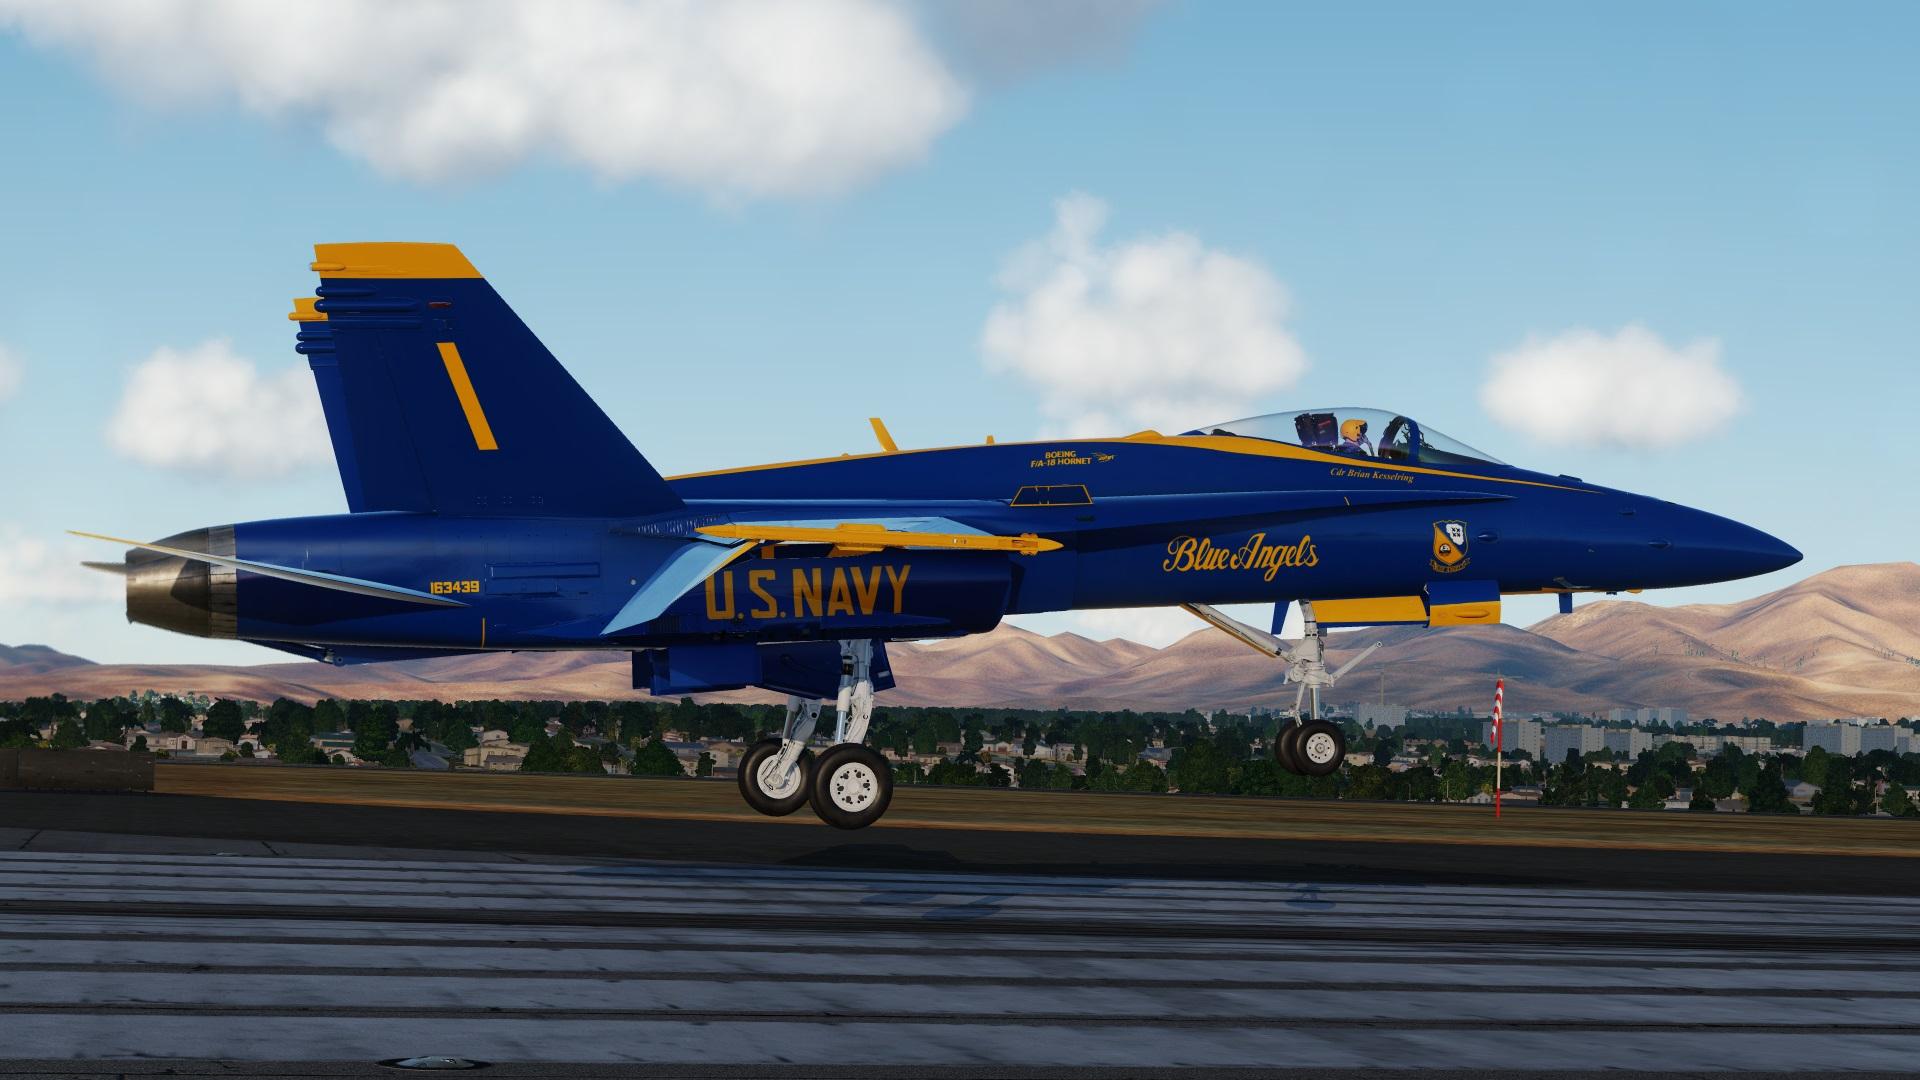 Обои Blue angels, Speed, wallpapers, navy. Авиация foto 8